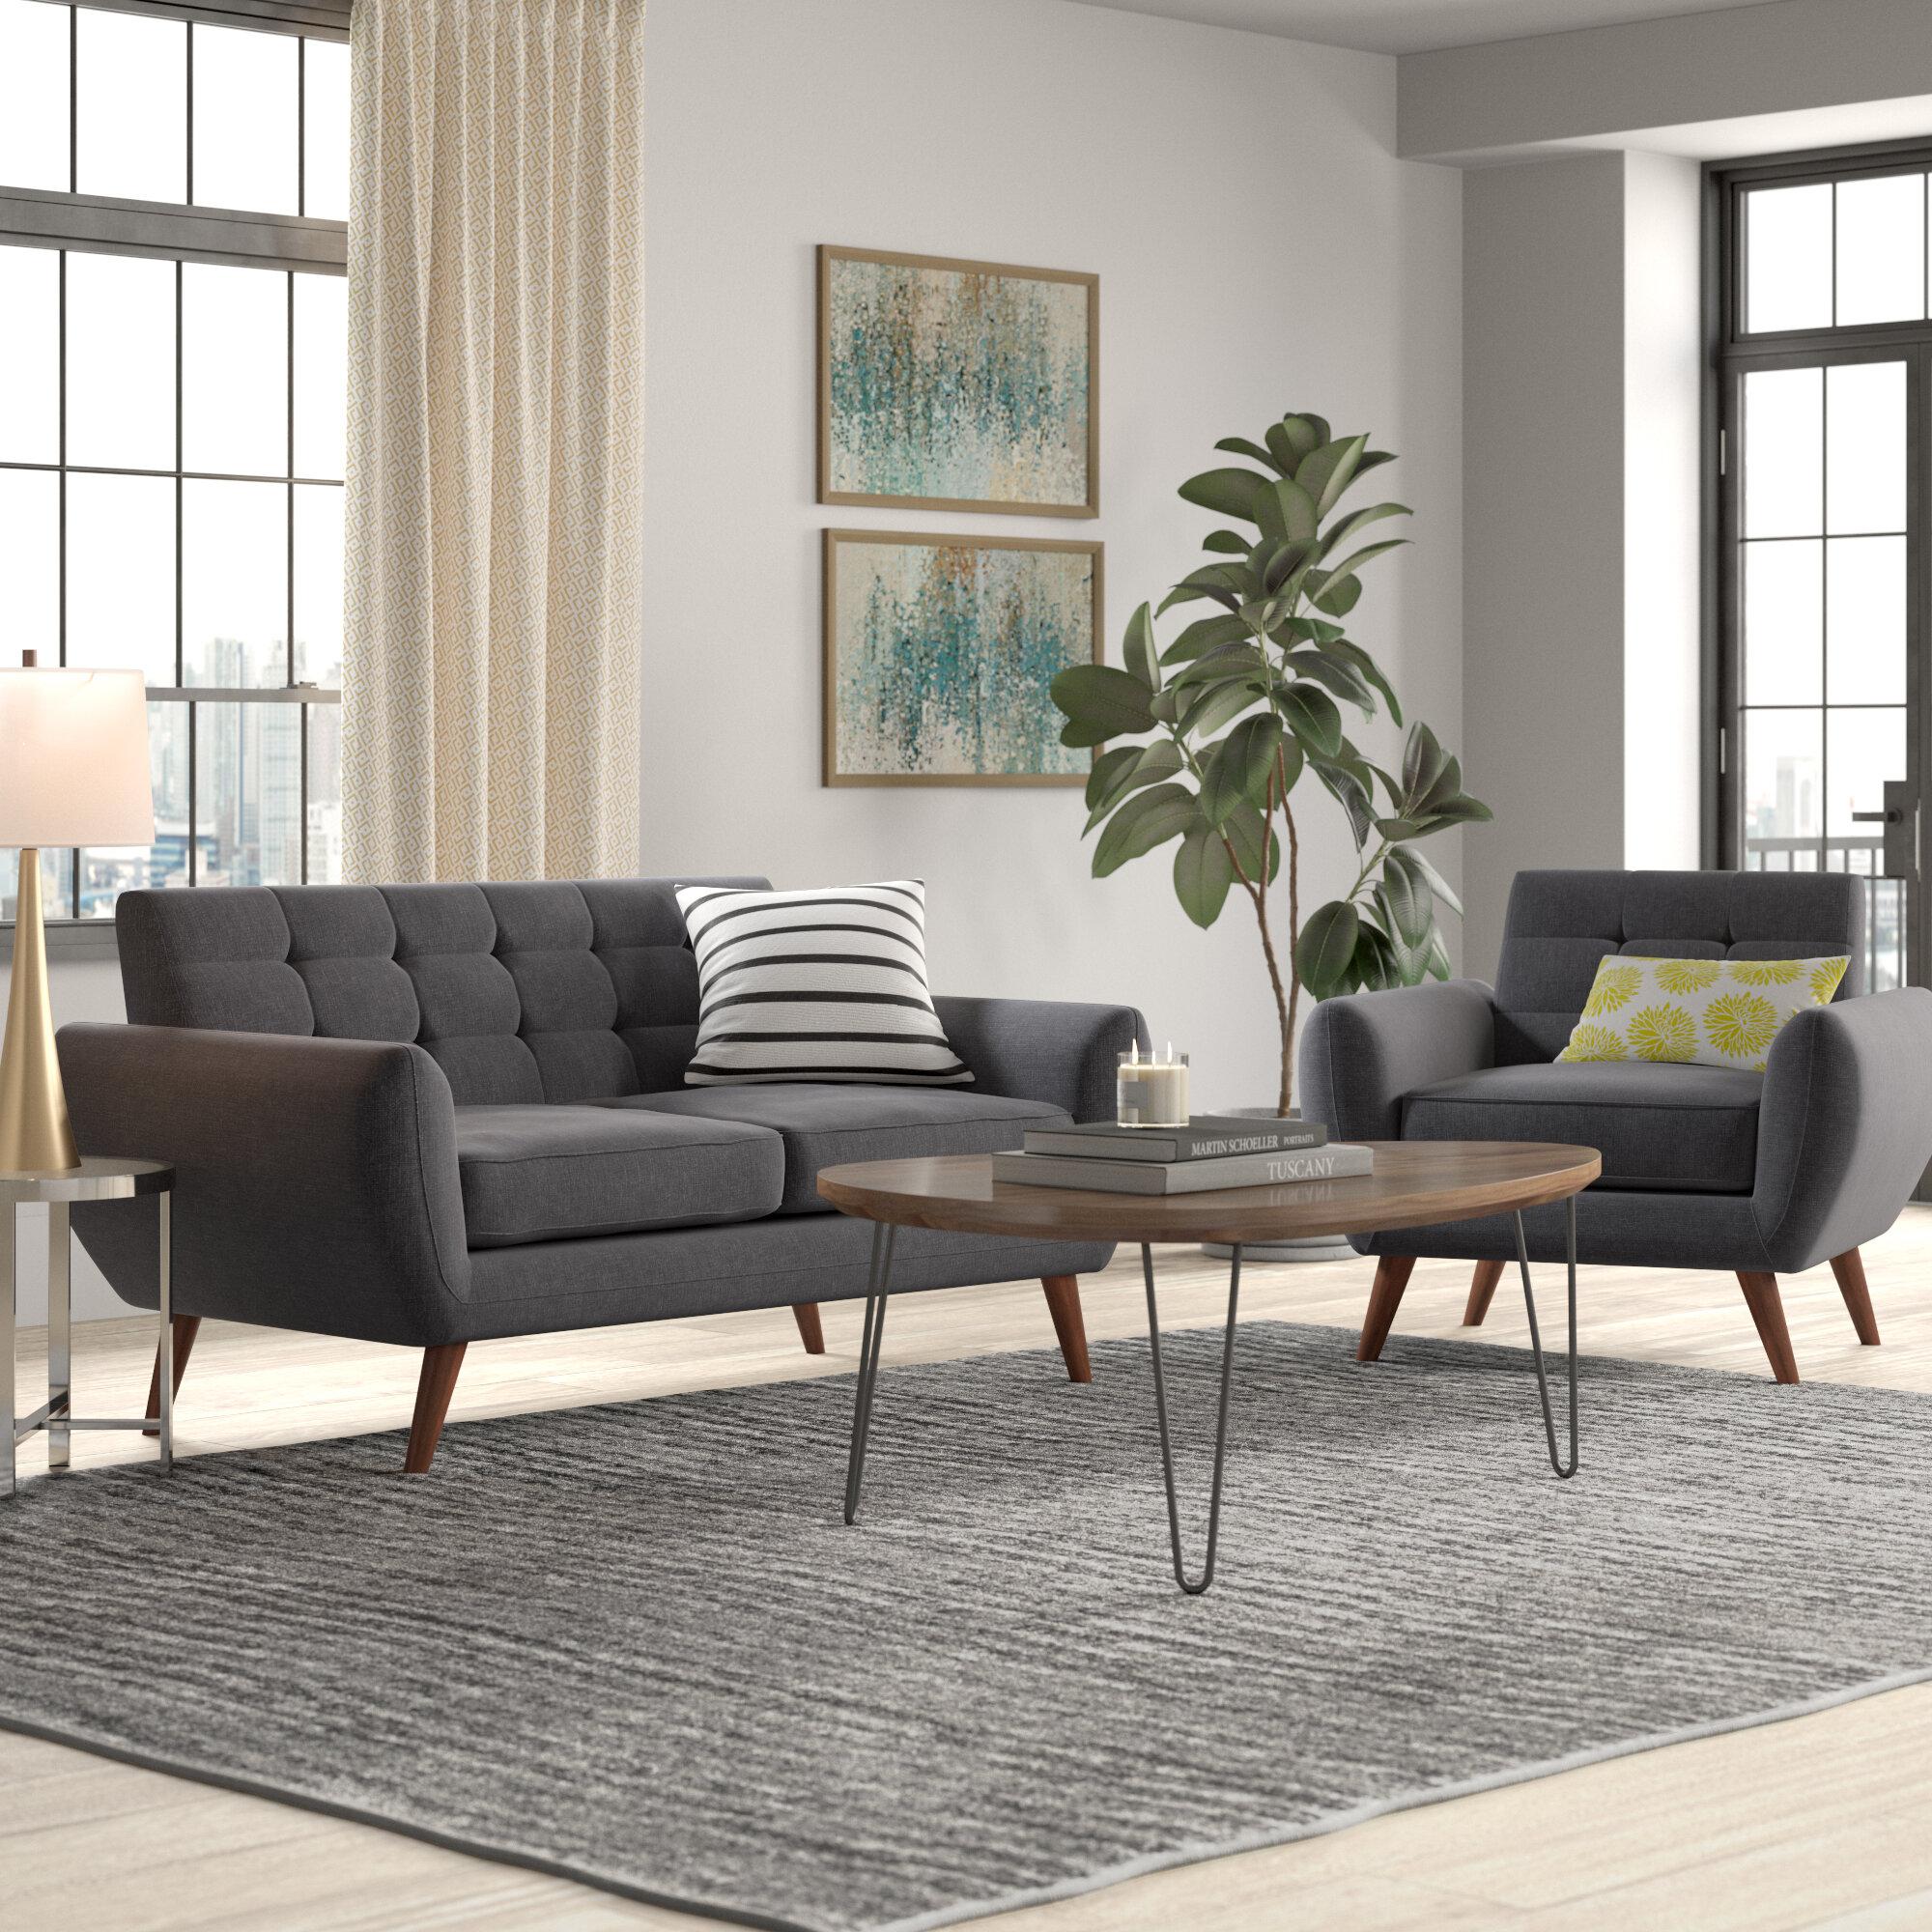 Philip 2 Piece Living Room Set